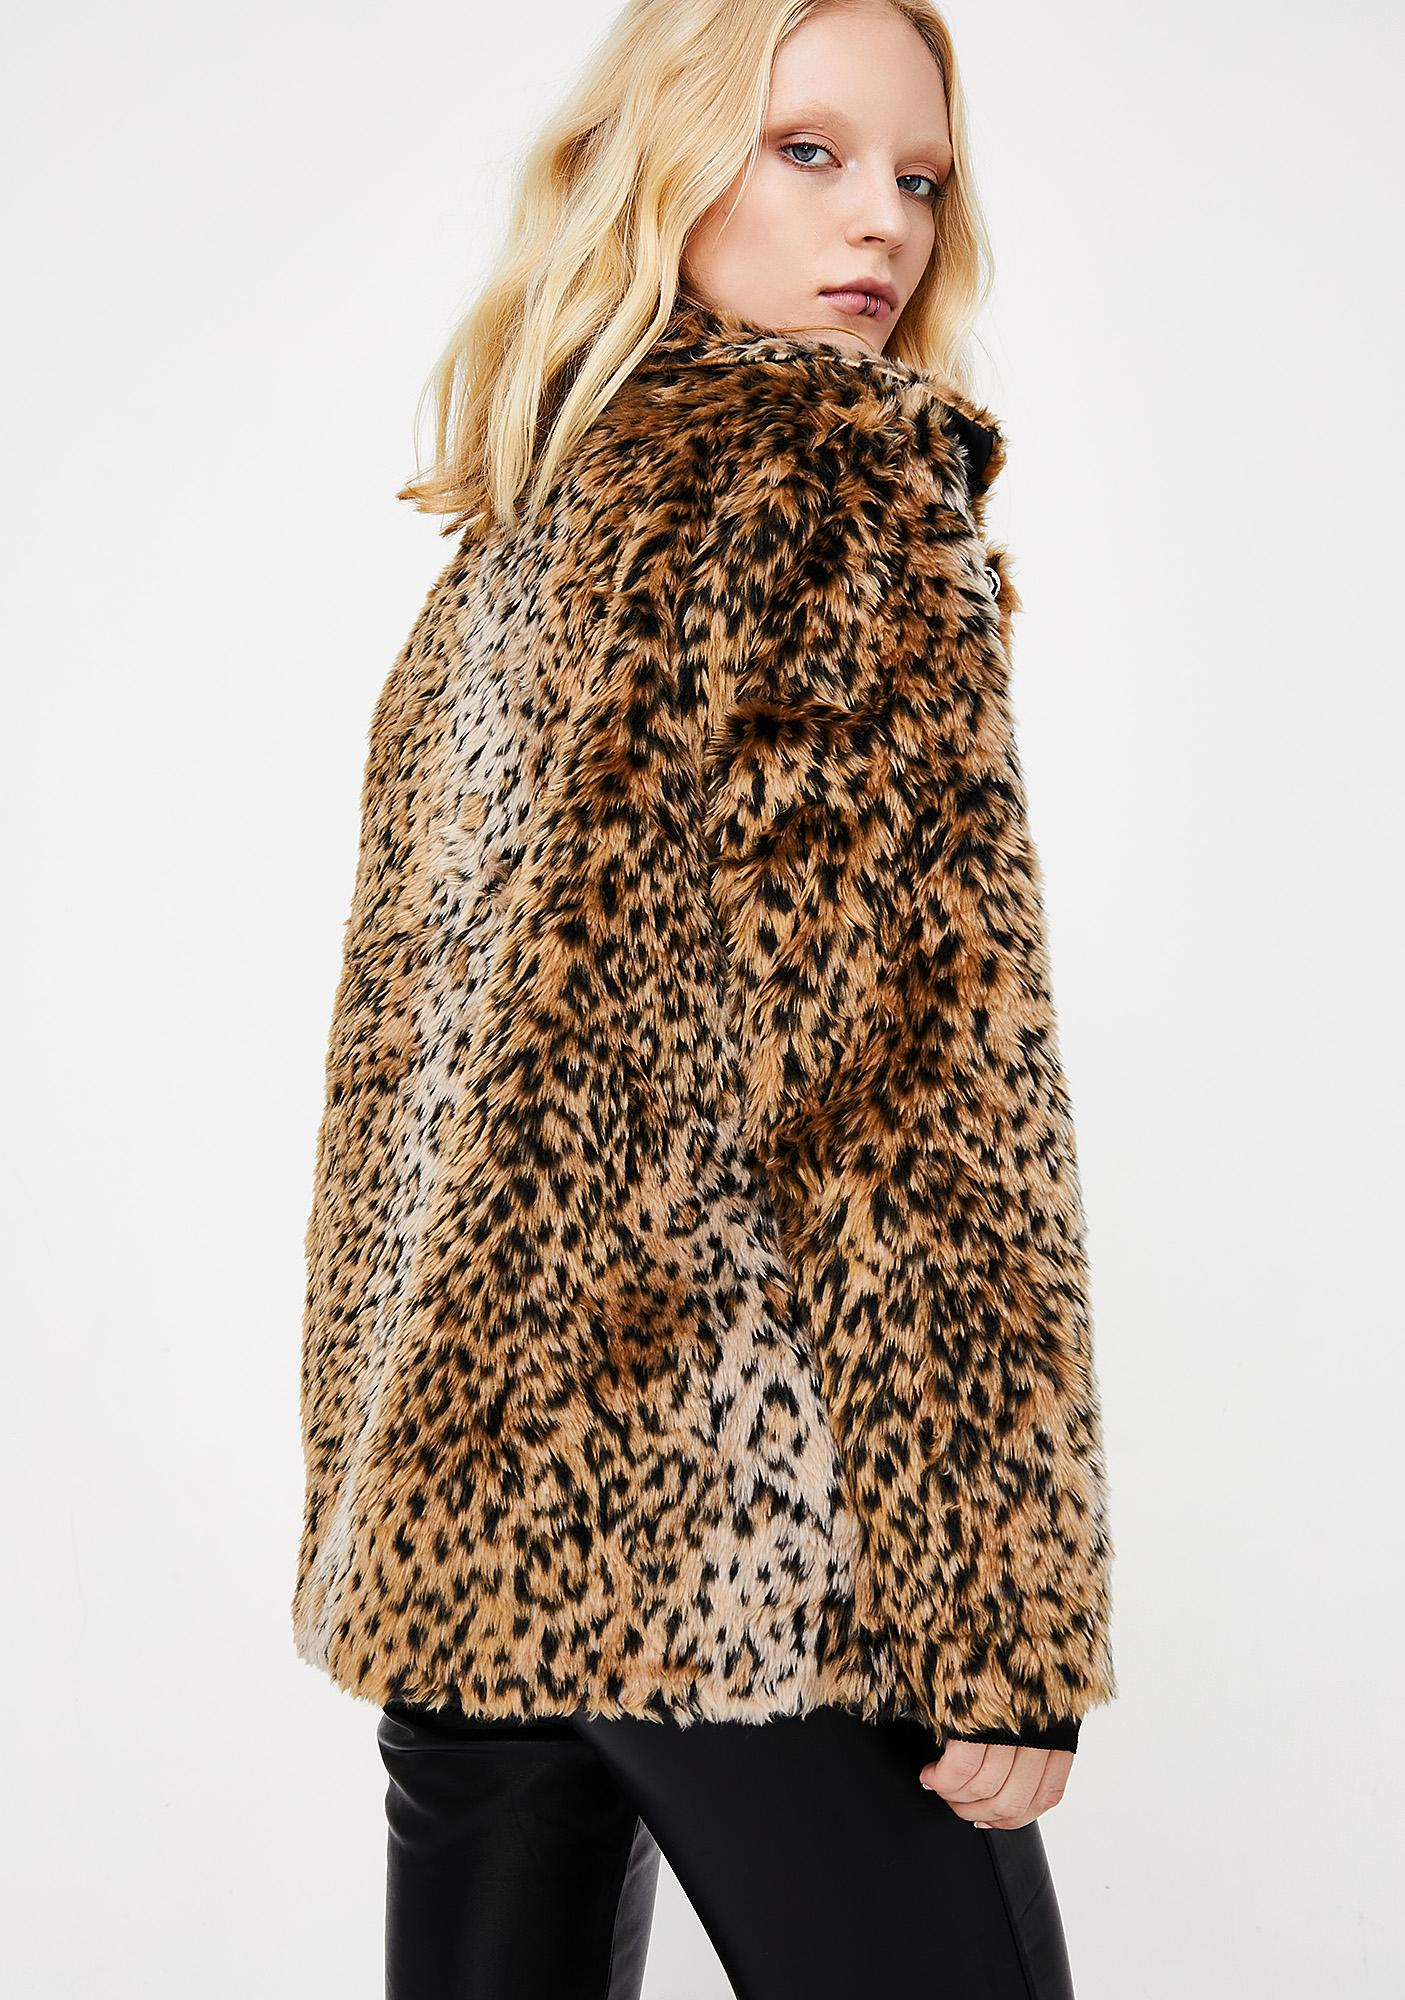 Friends Furever Furry Jacket